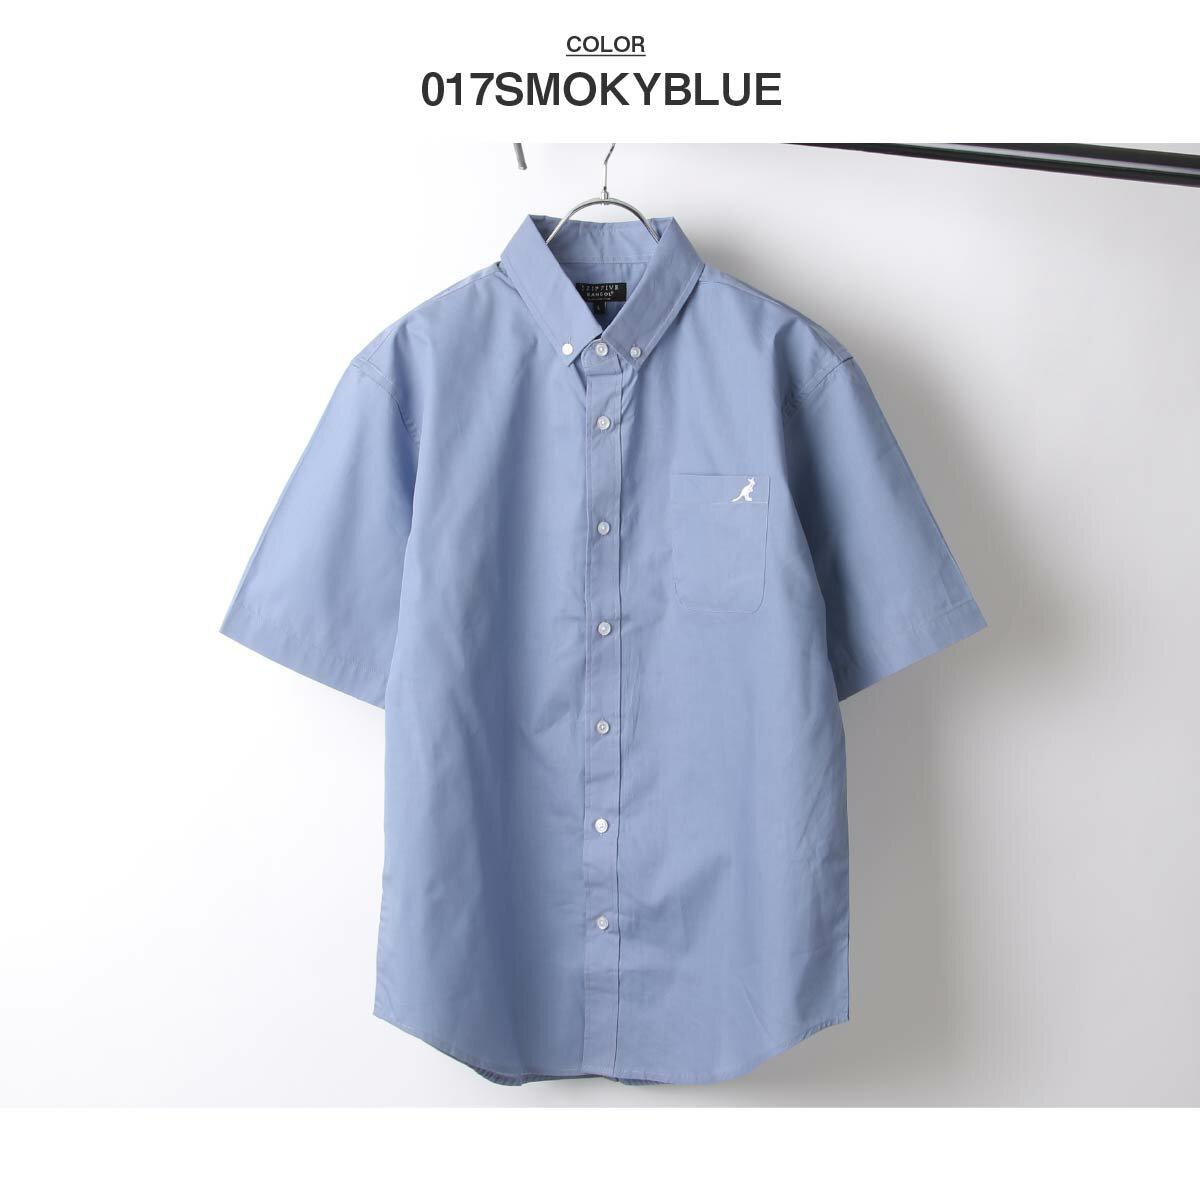 KANGOL短袖襯衫 特注款 KANGOL 袋鼠 2